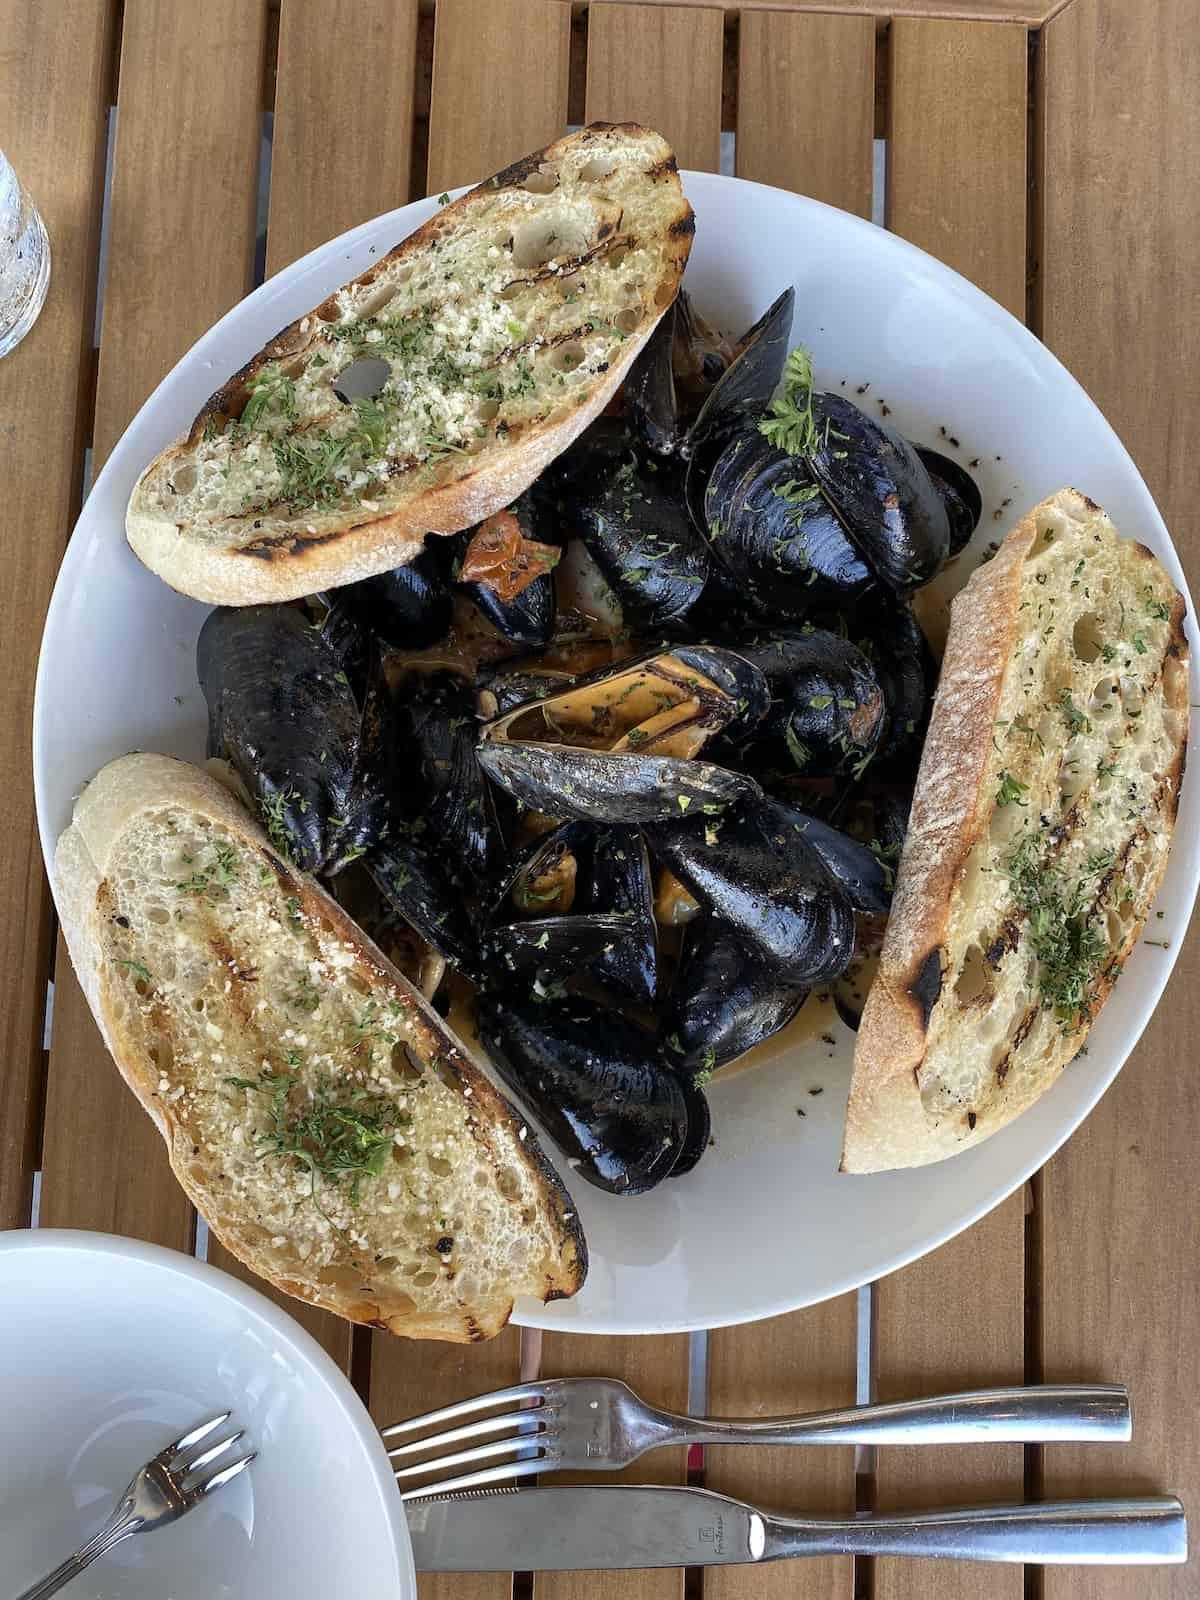 Mussels at Libby's Bradenton restaurant.